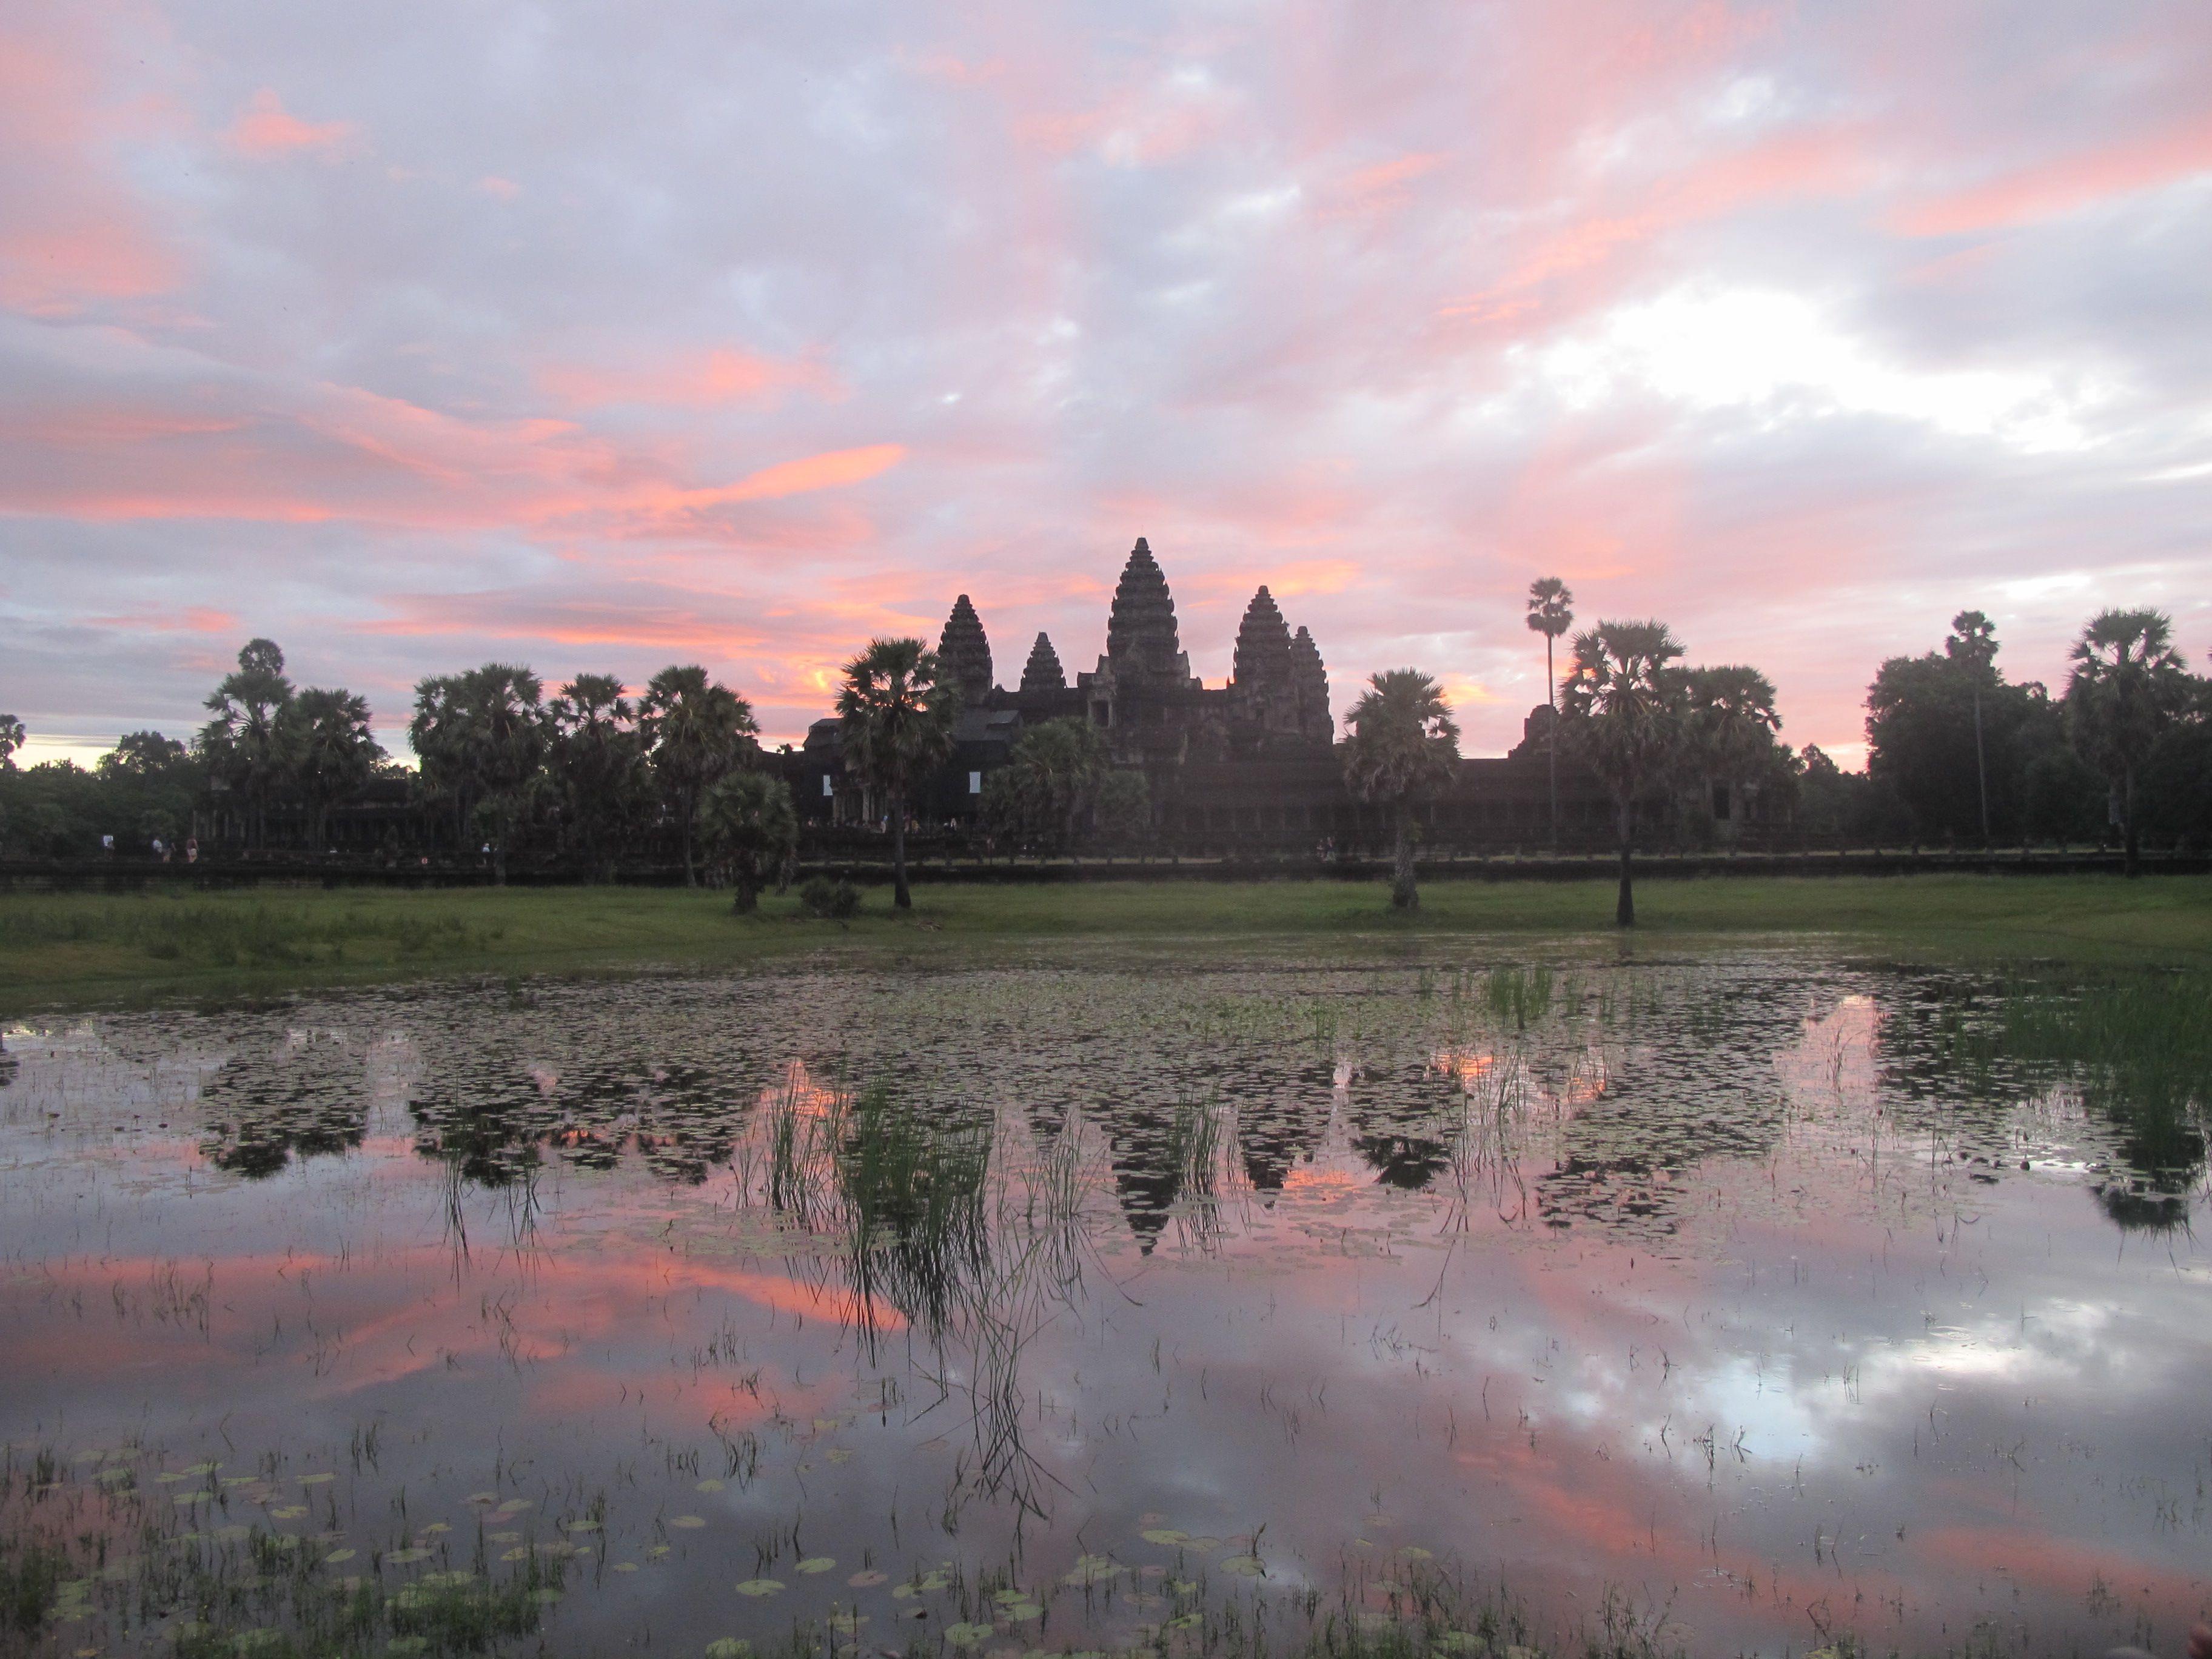 Cambodia 5am sunrise, Angkor Wat